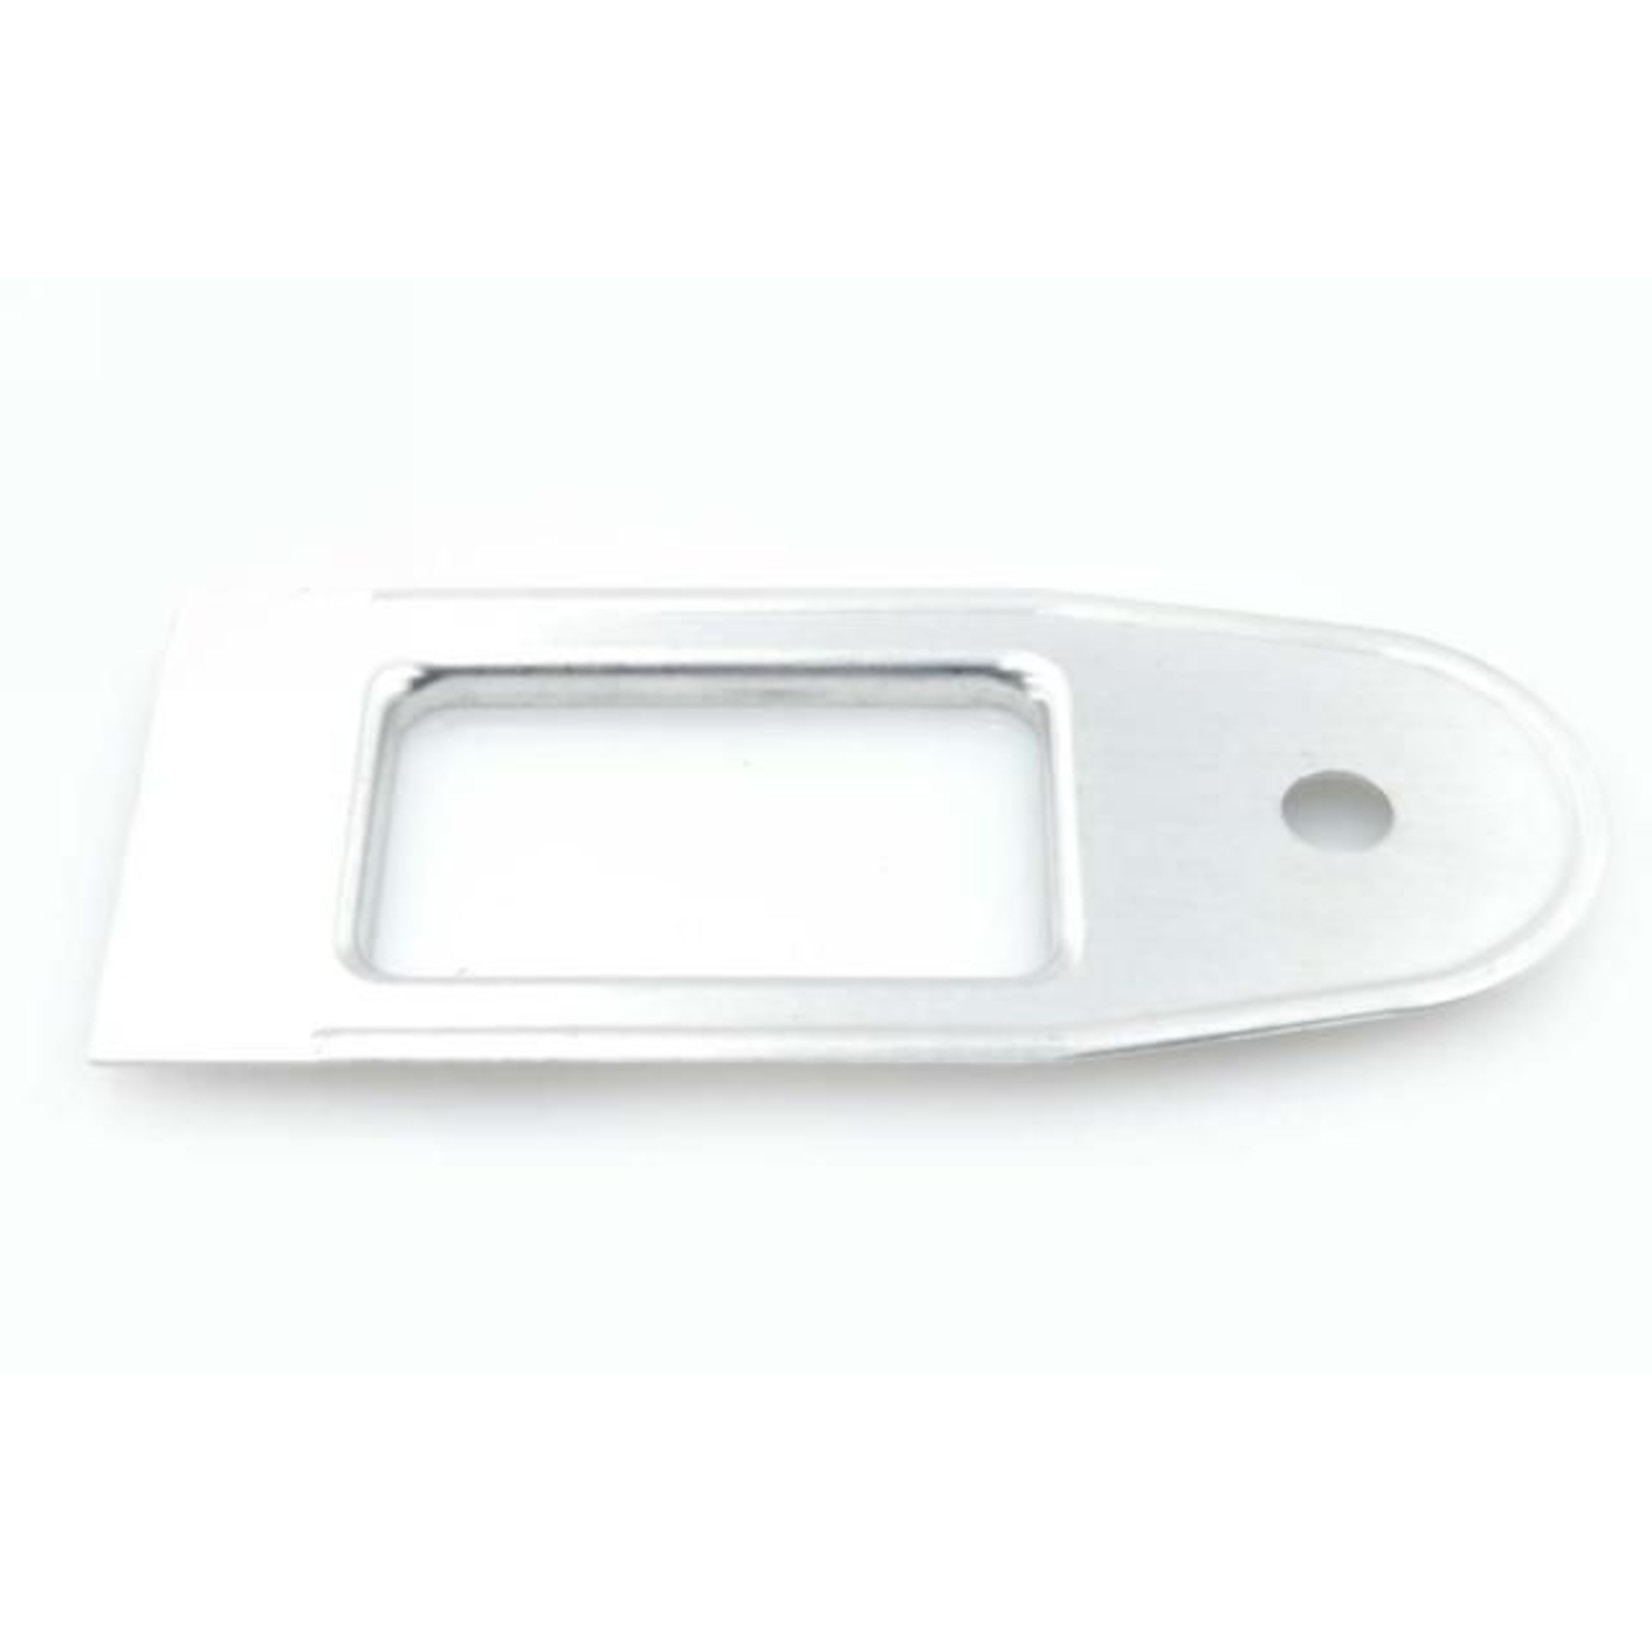 Check plate passage rear door aluminium Nr Org: DS84255B